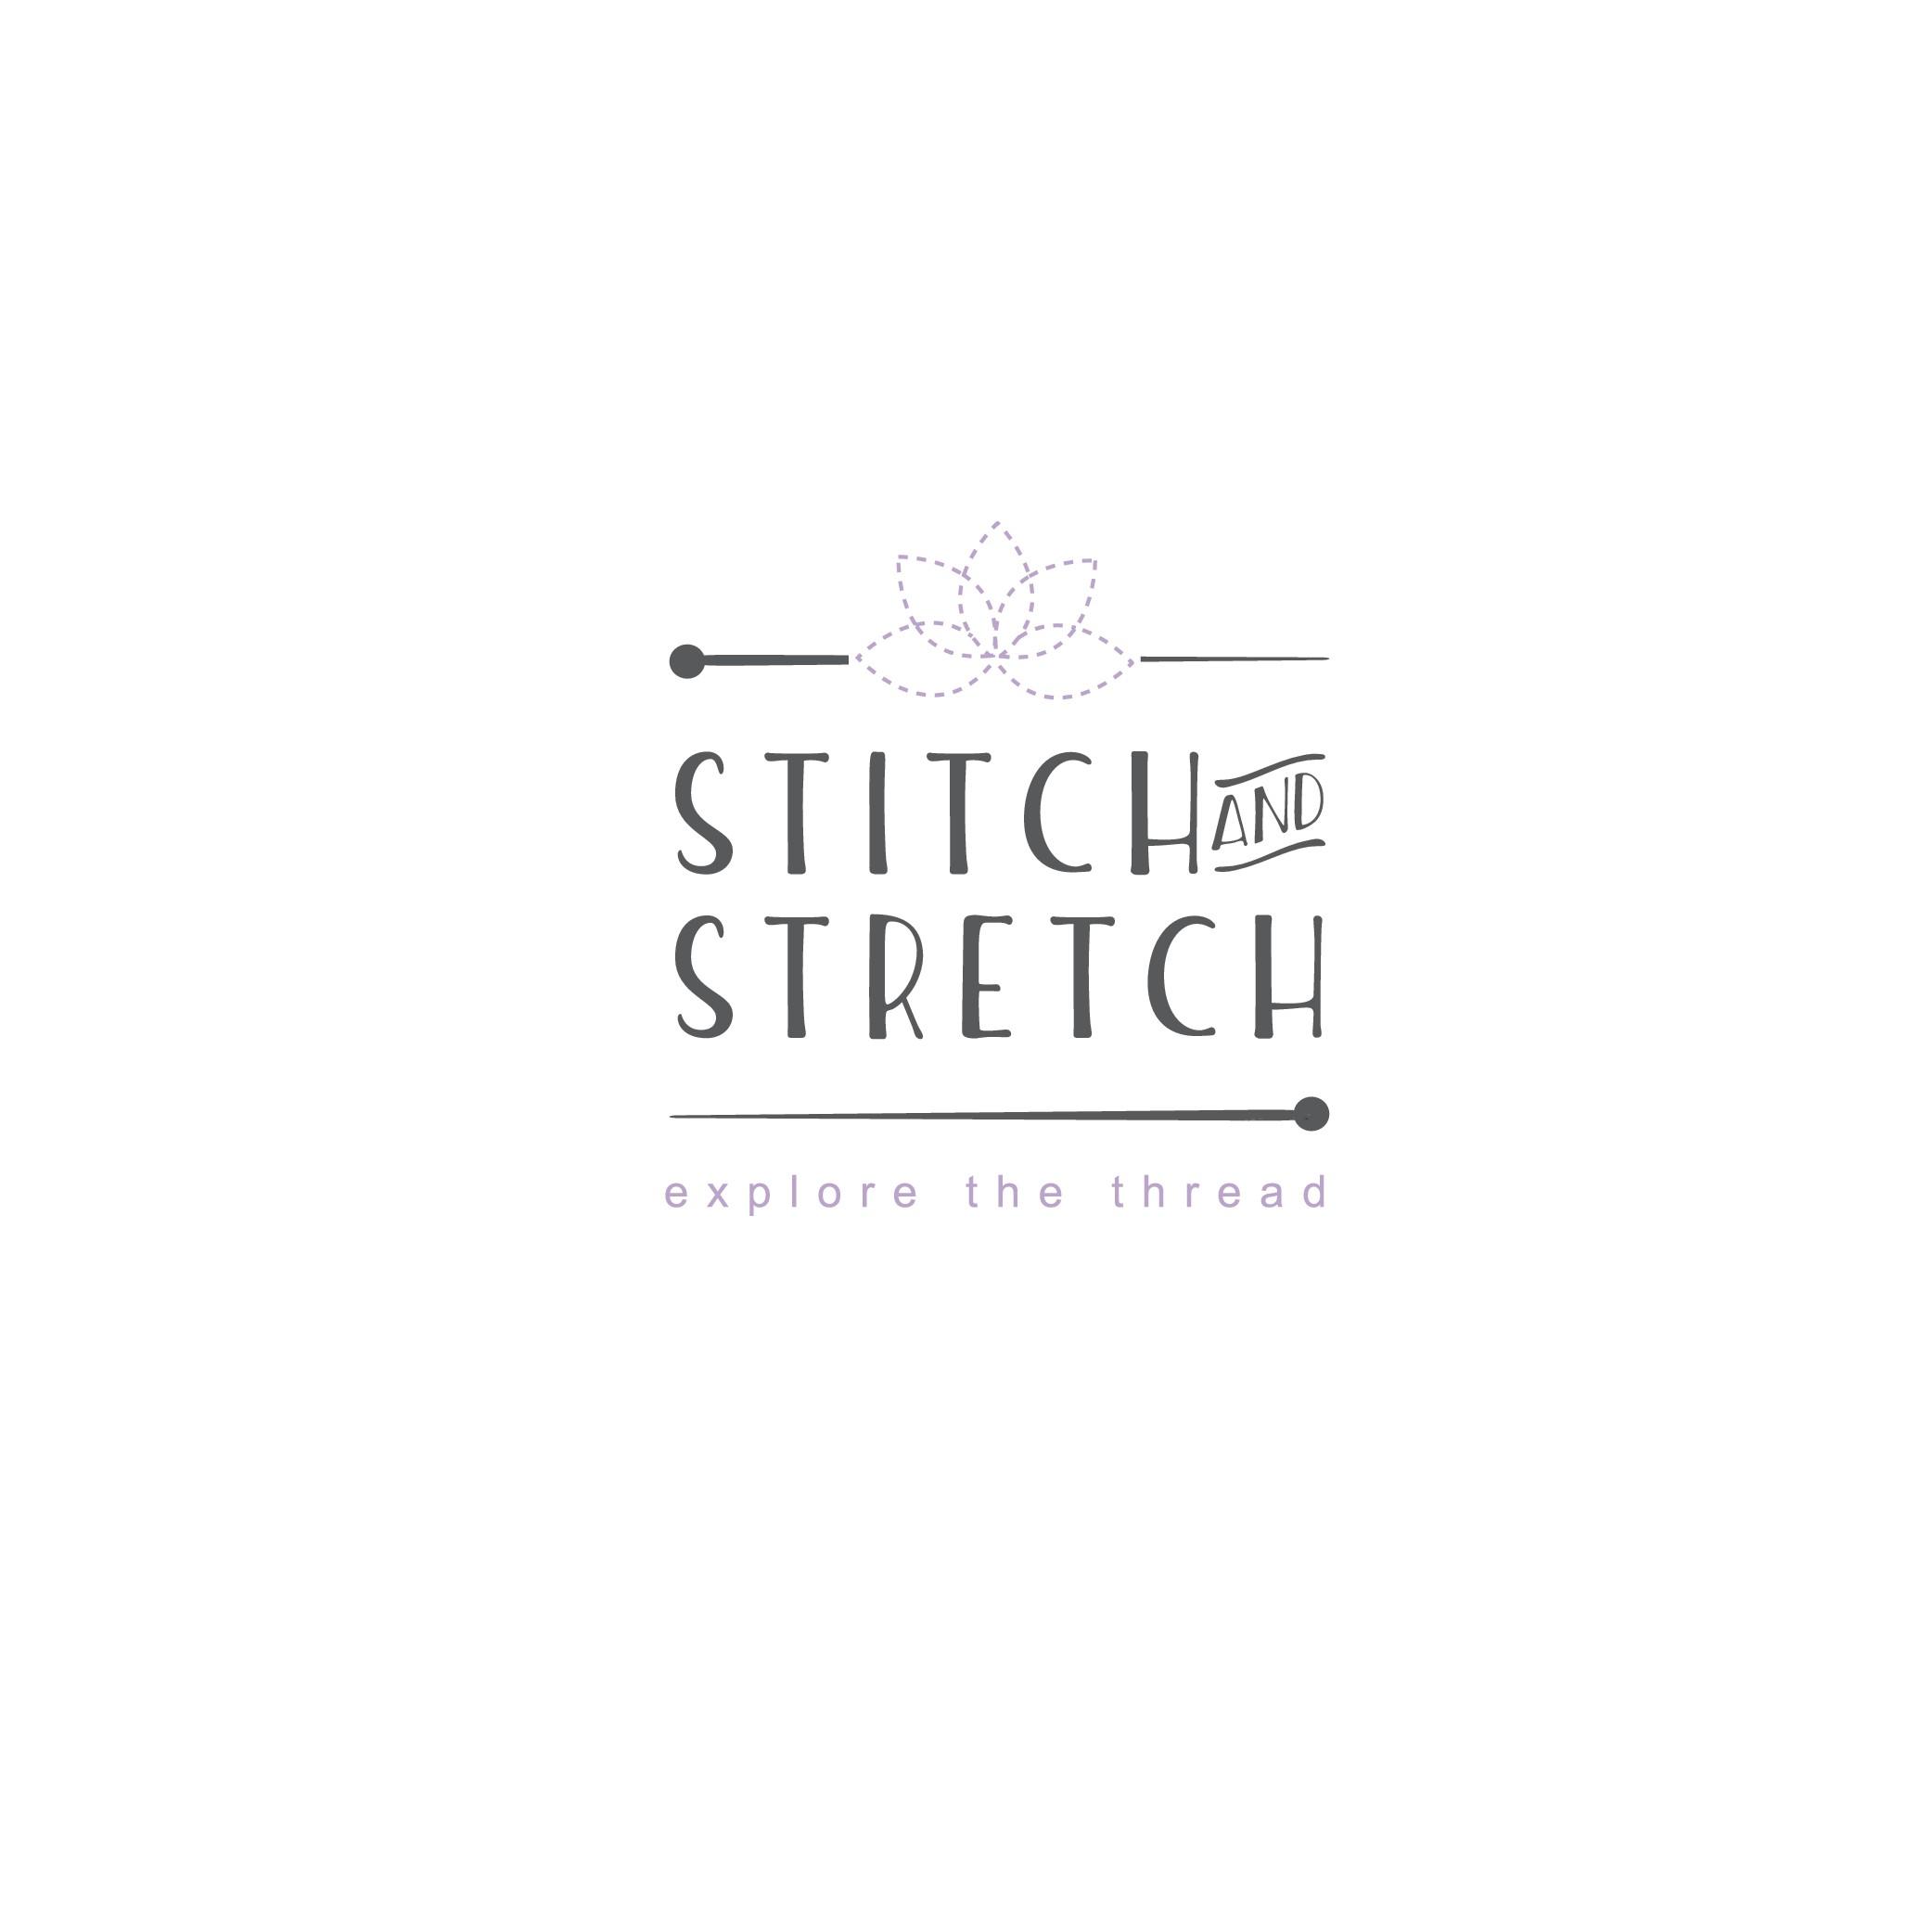 Design a Crafty Logo for Stitch and Stretch Blogsite